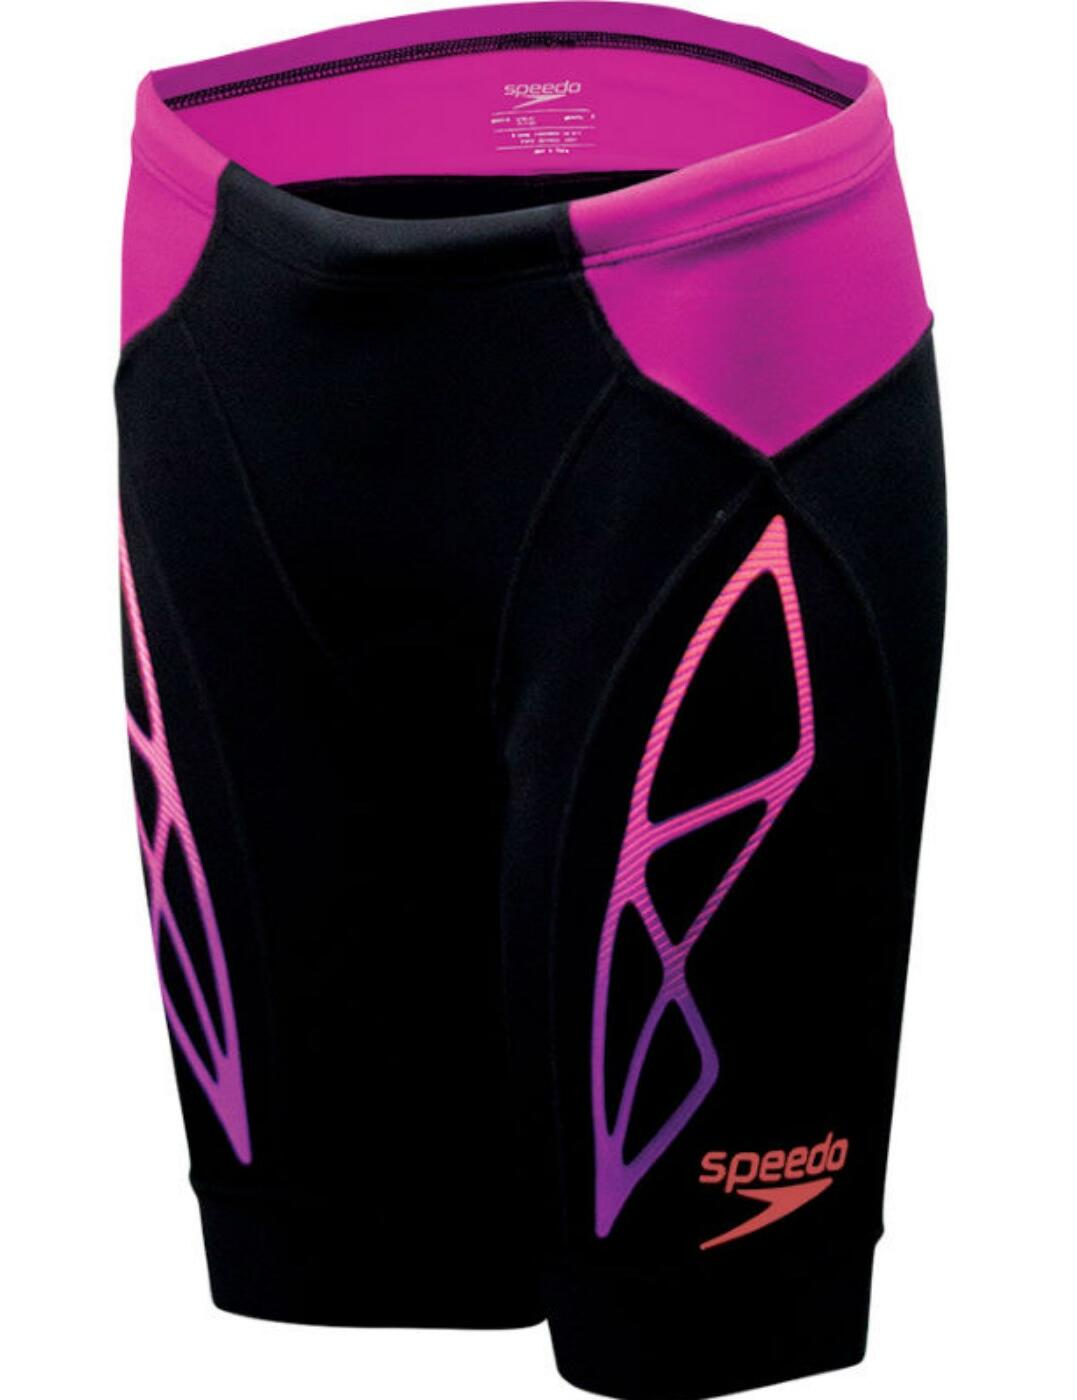 811426C148 Speedo Fastskin Xenon Triathlon Short  - 811426C148 Black/Fuchsia